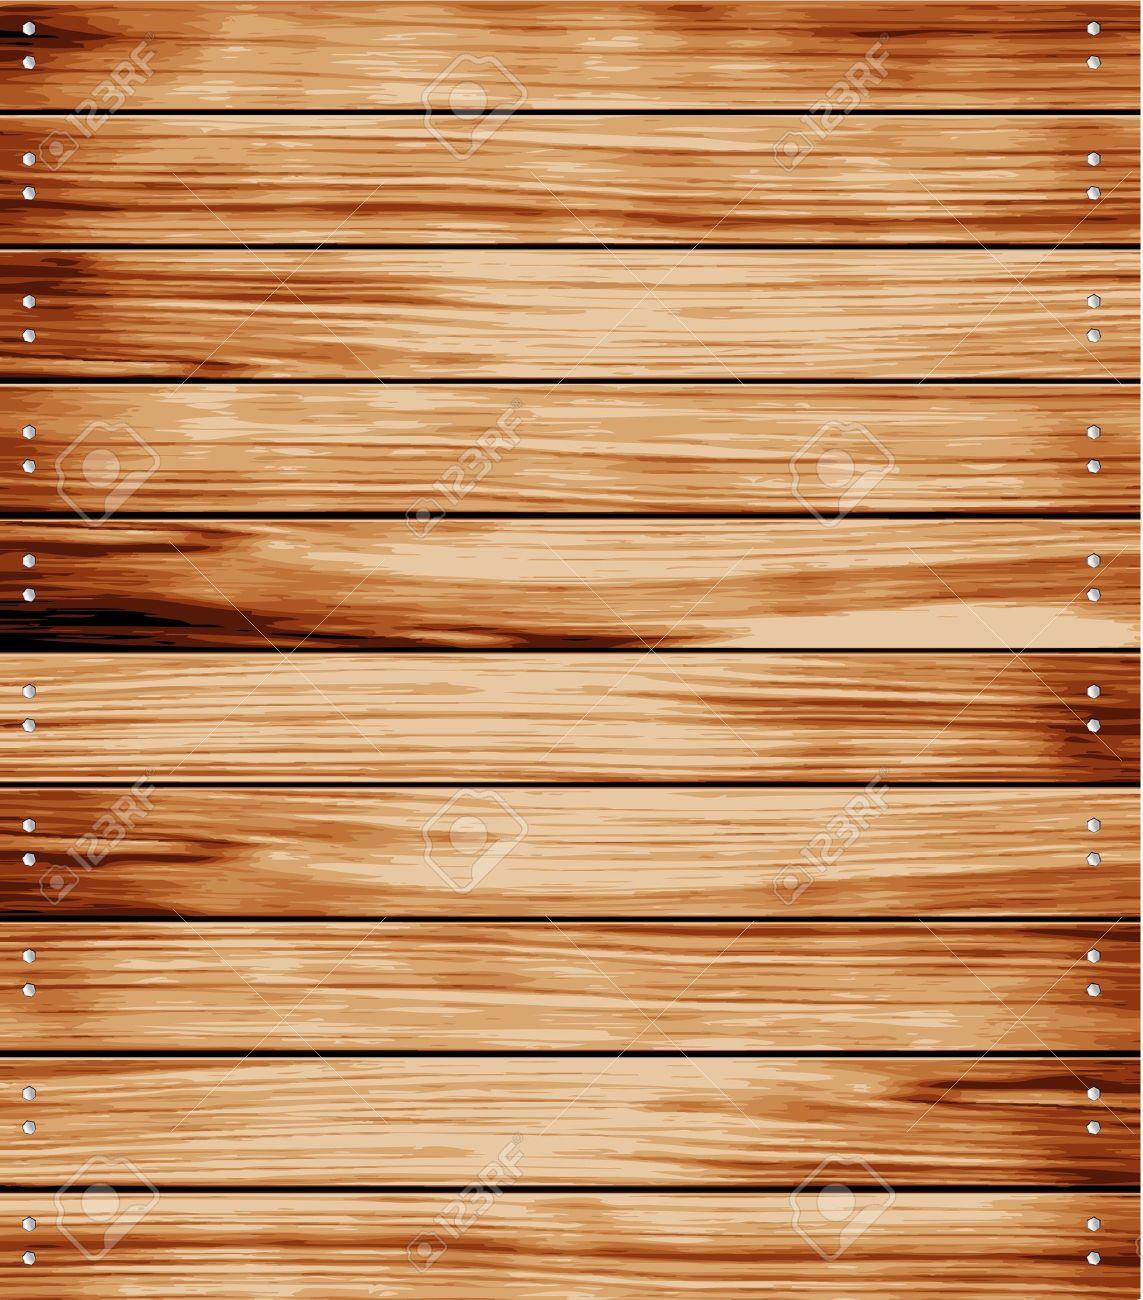 Wooden texture background. vector illustration. Stock Vector - 13328183